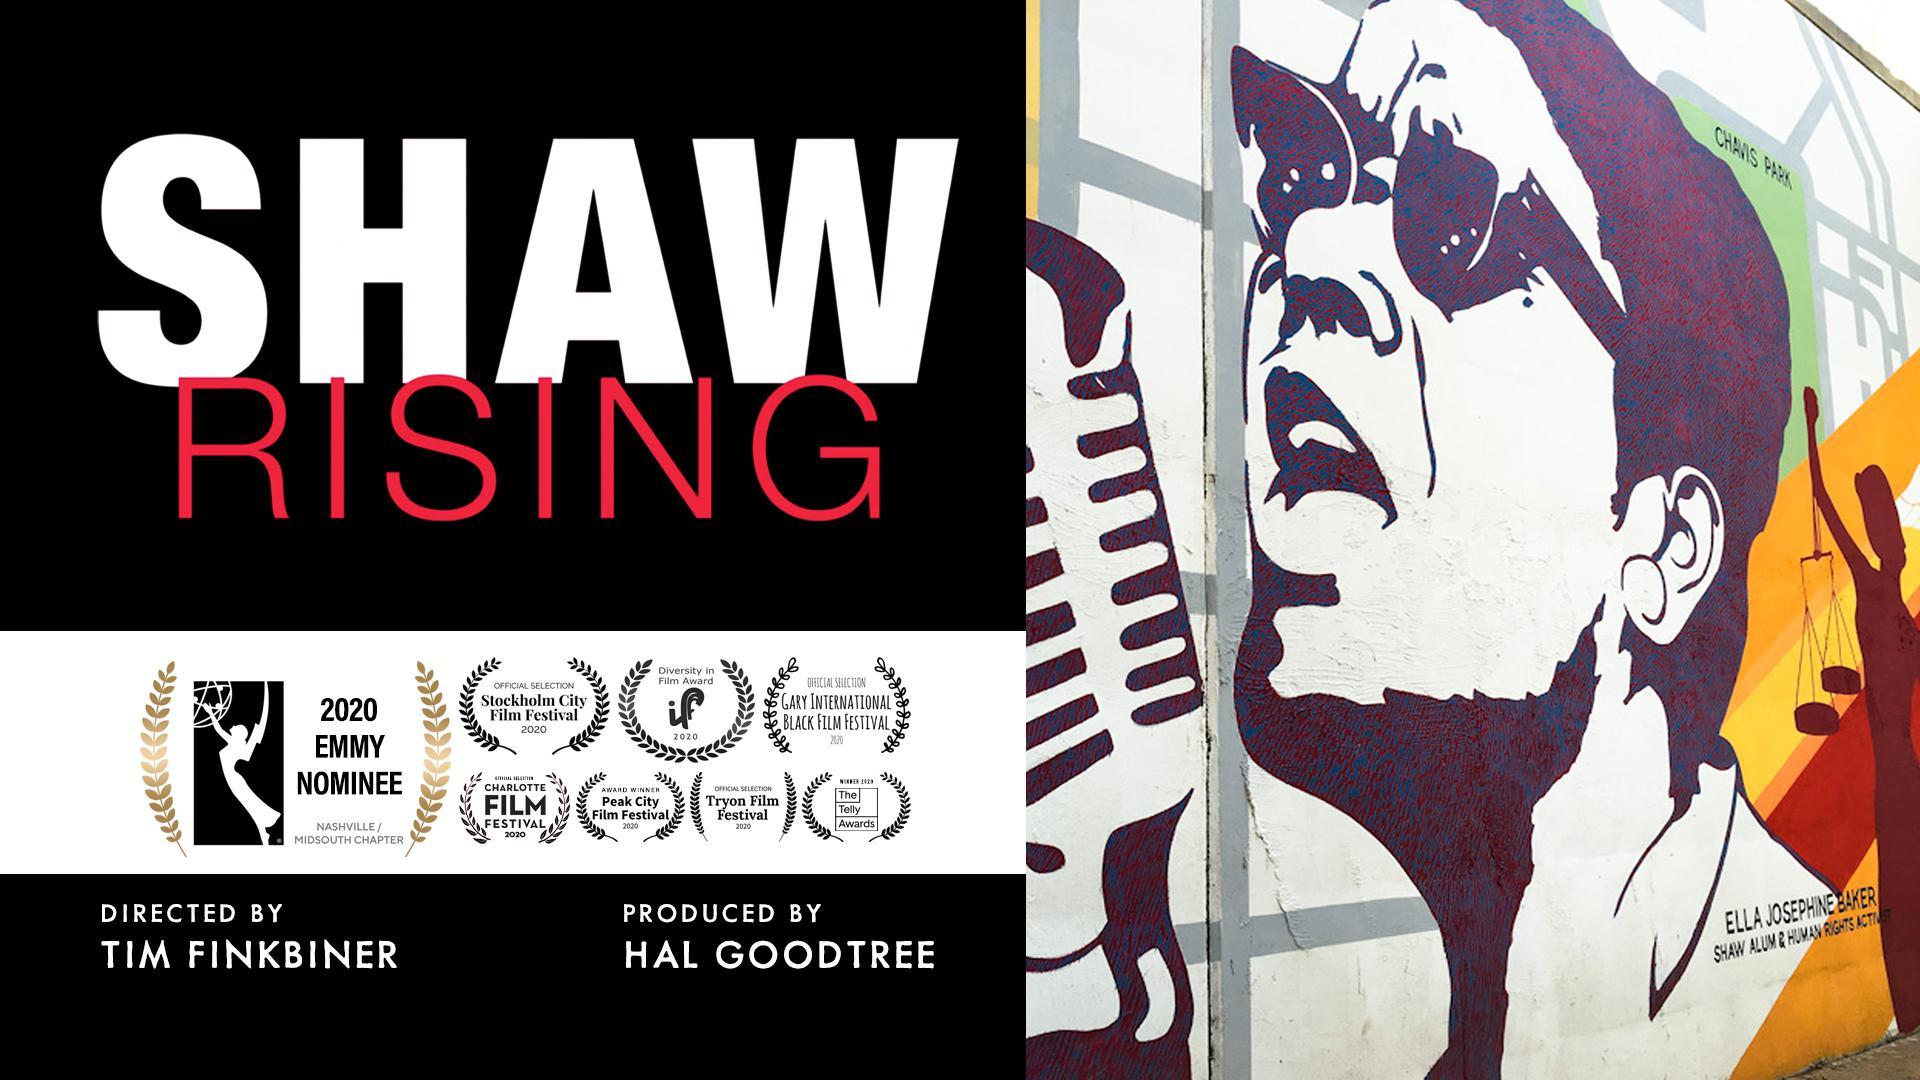 Shaw Rising